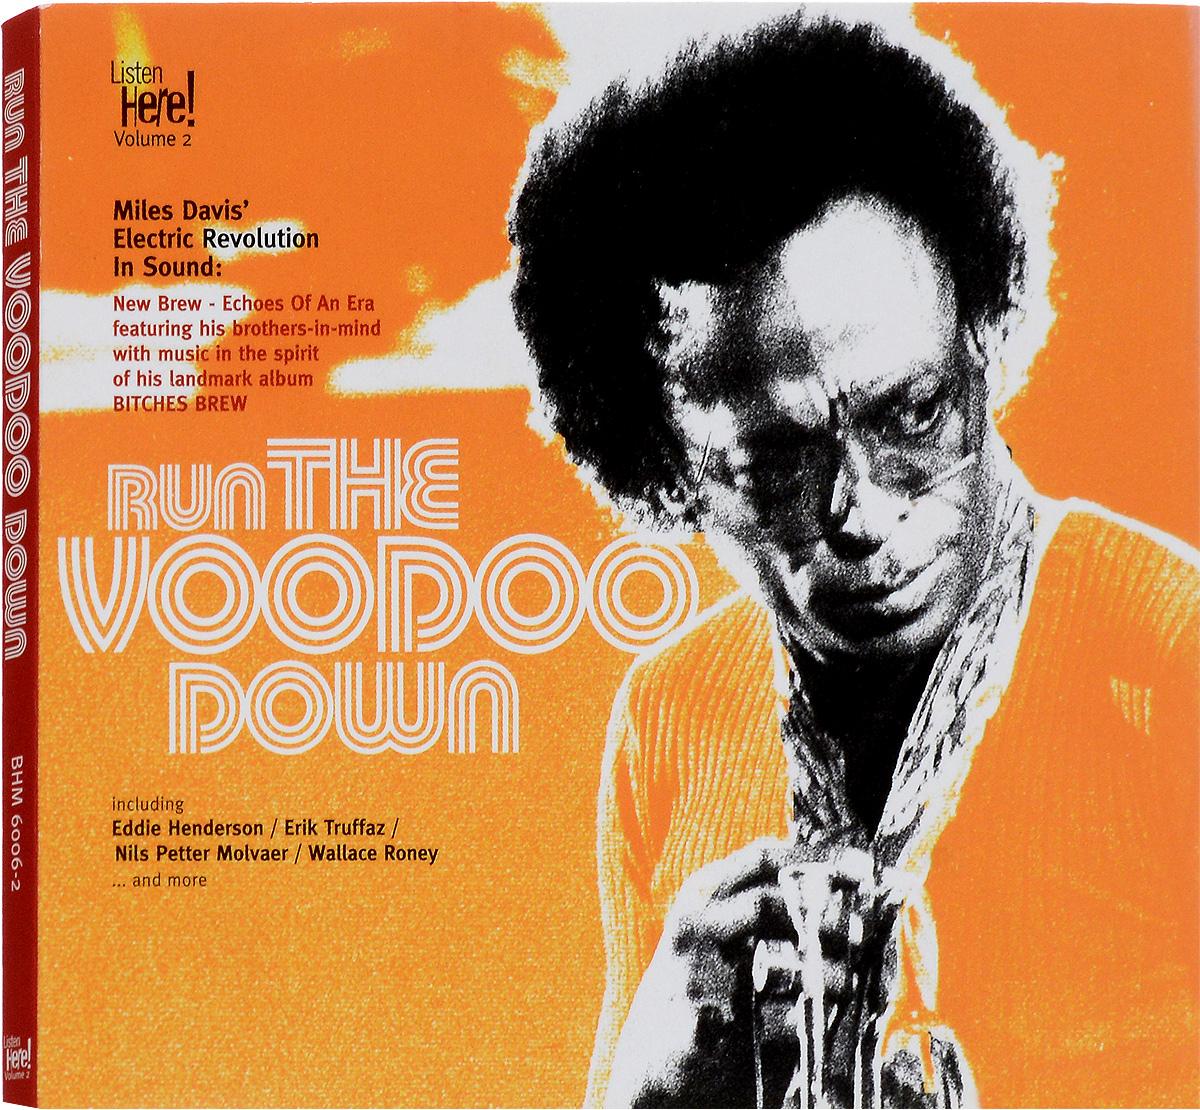 все цены на Эдди Хендерсон,Umo Jazz Orchestra,Орсет Эйвинд,Эрик Трюффаз,Мишель Бенита,Тим Хэгенс,Уоллес Рони,Расселл Ганн,Бенни Мопин Run The Voodoo Down. Listen Here! Volume 2 онлайн